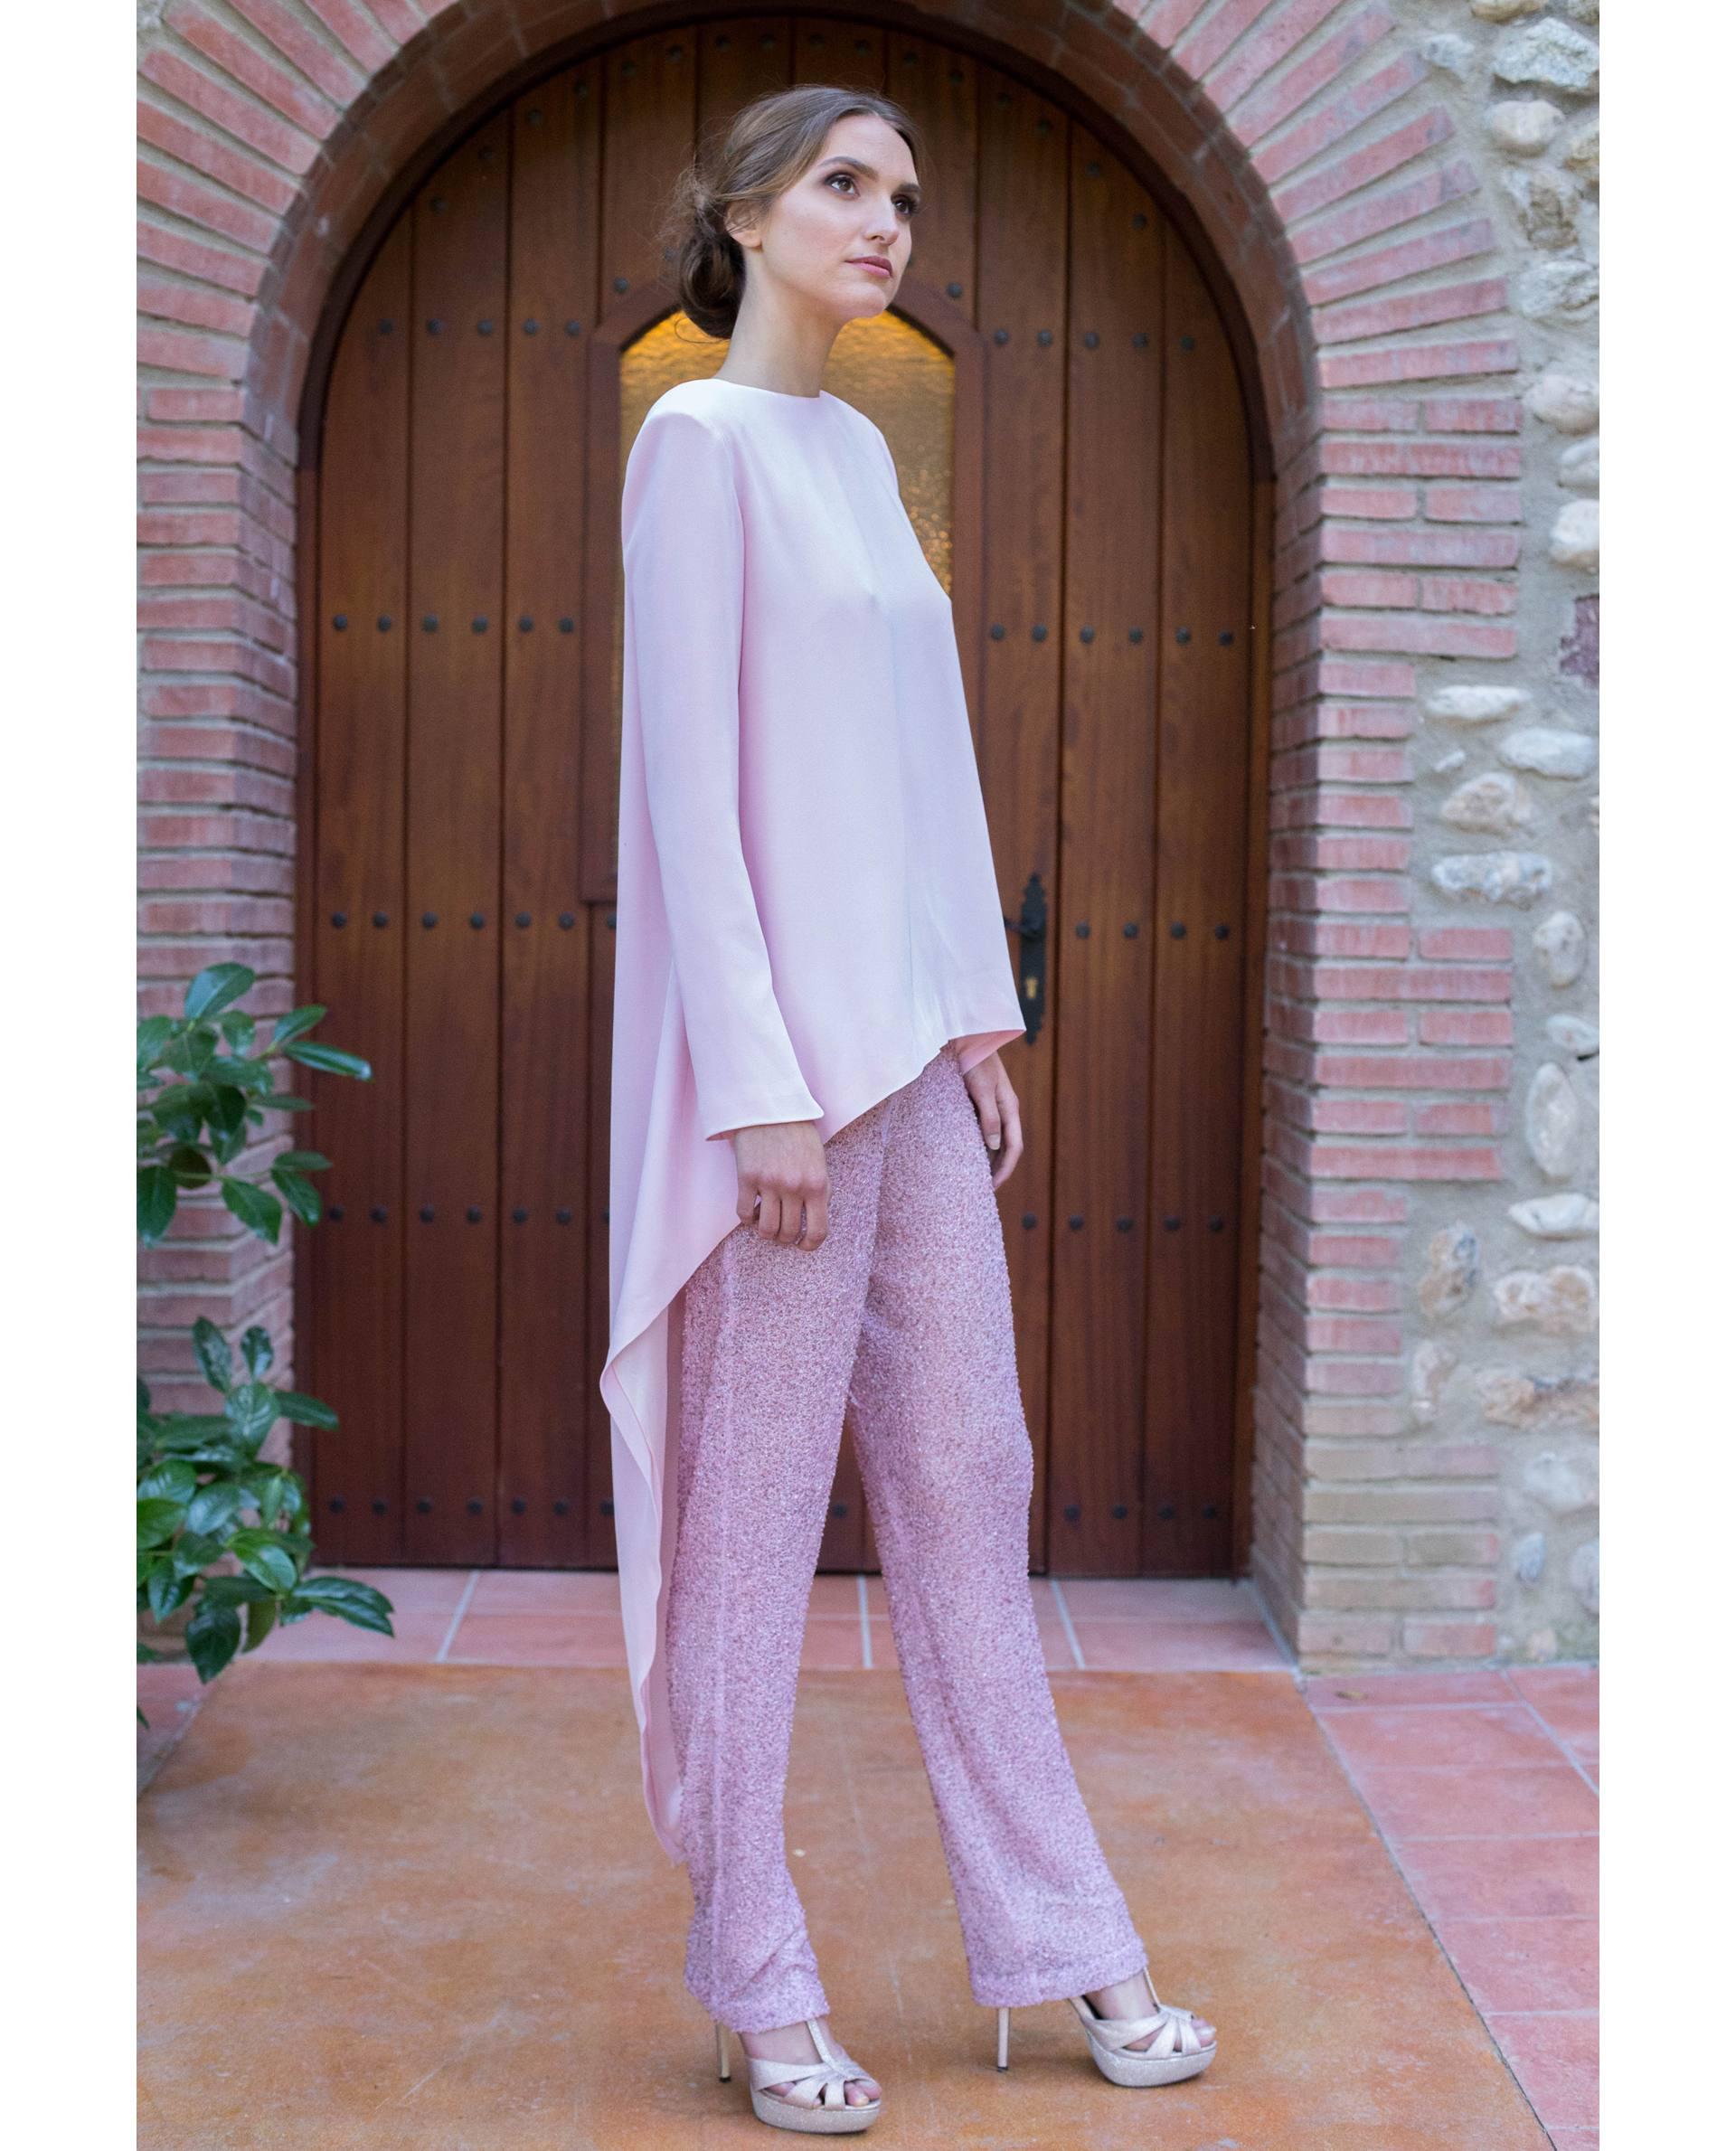 ATELIER-NATURE 2017/18 - BLUSAS - blusa fiesta andra rosa